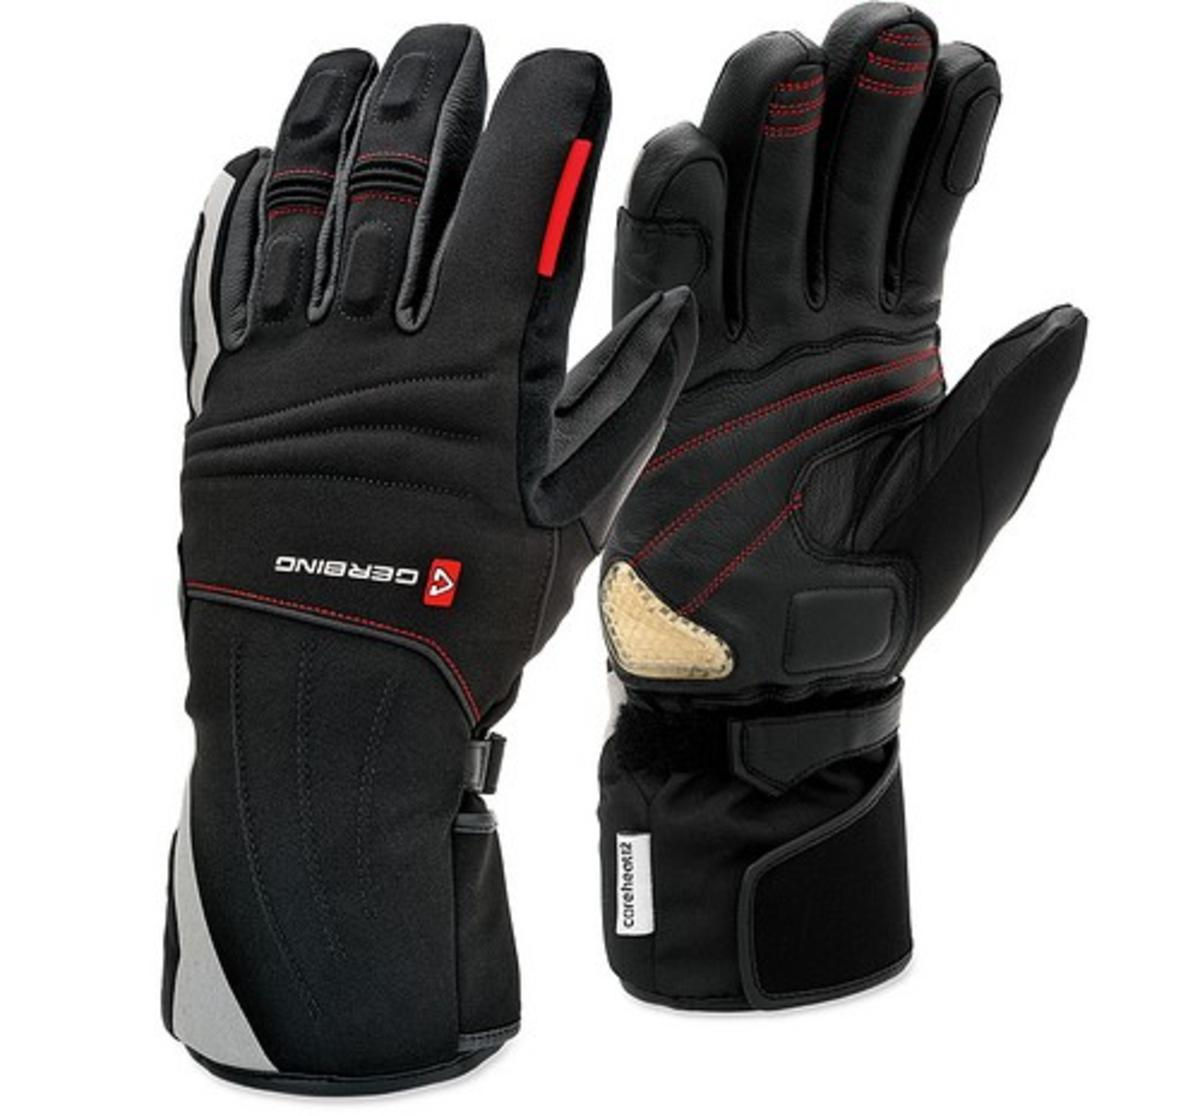 Gerbing EX Heated Gloves - 12V Motorcycle